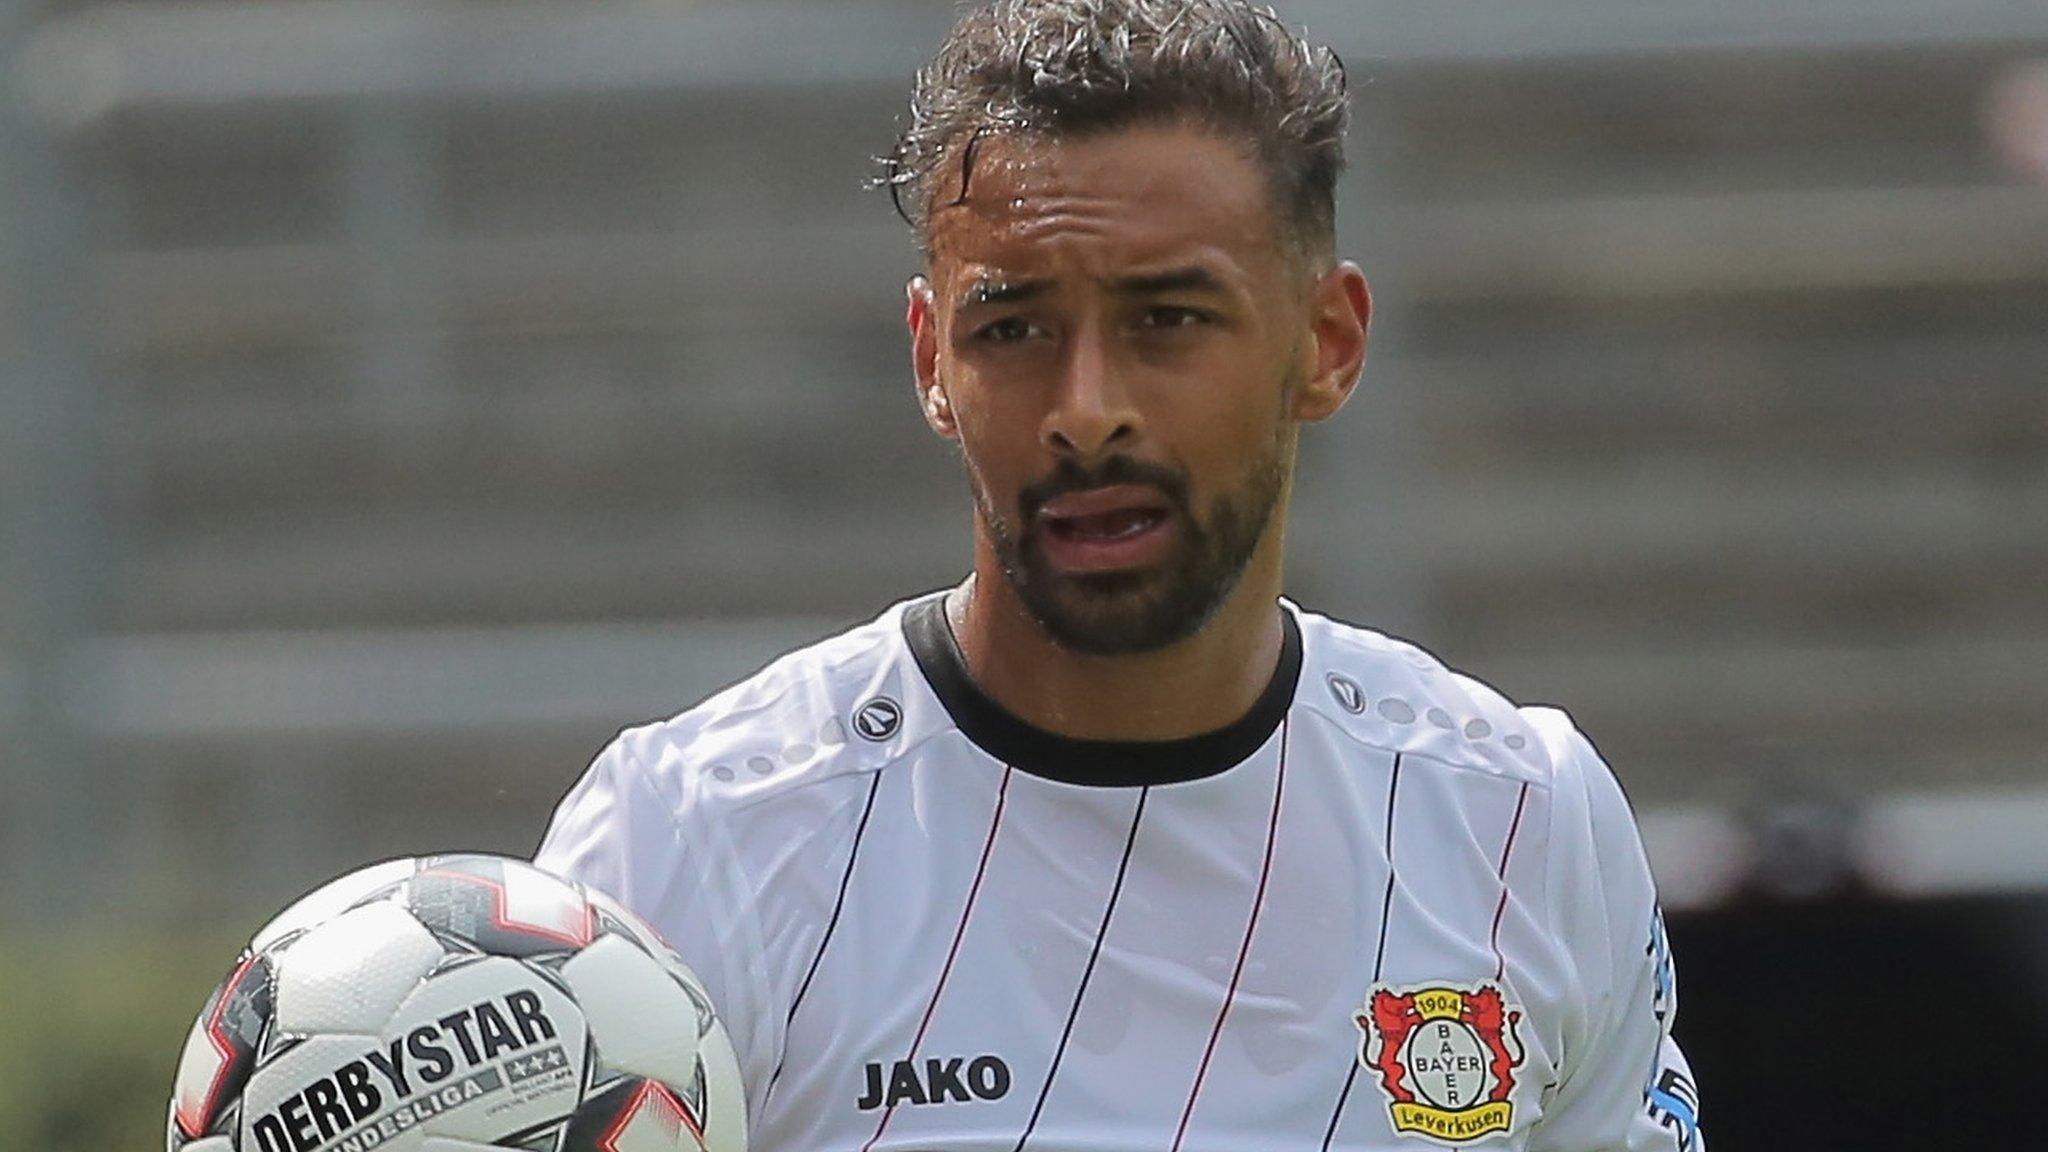 Leverkusen winger leaves hospital after collapsing during match